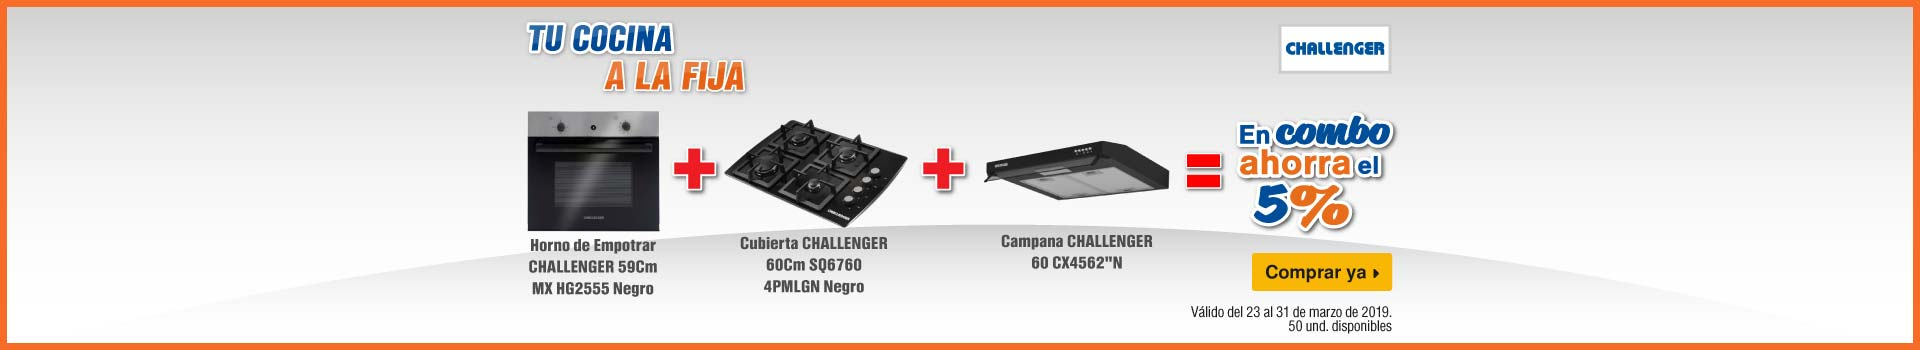 AK-KT-mayores-2-ELECT-BCAT-cocina-challenger-230319-extra